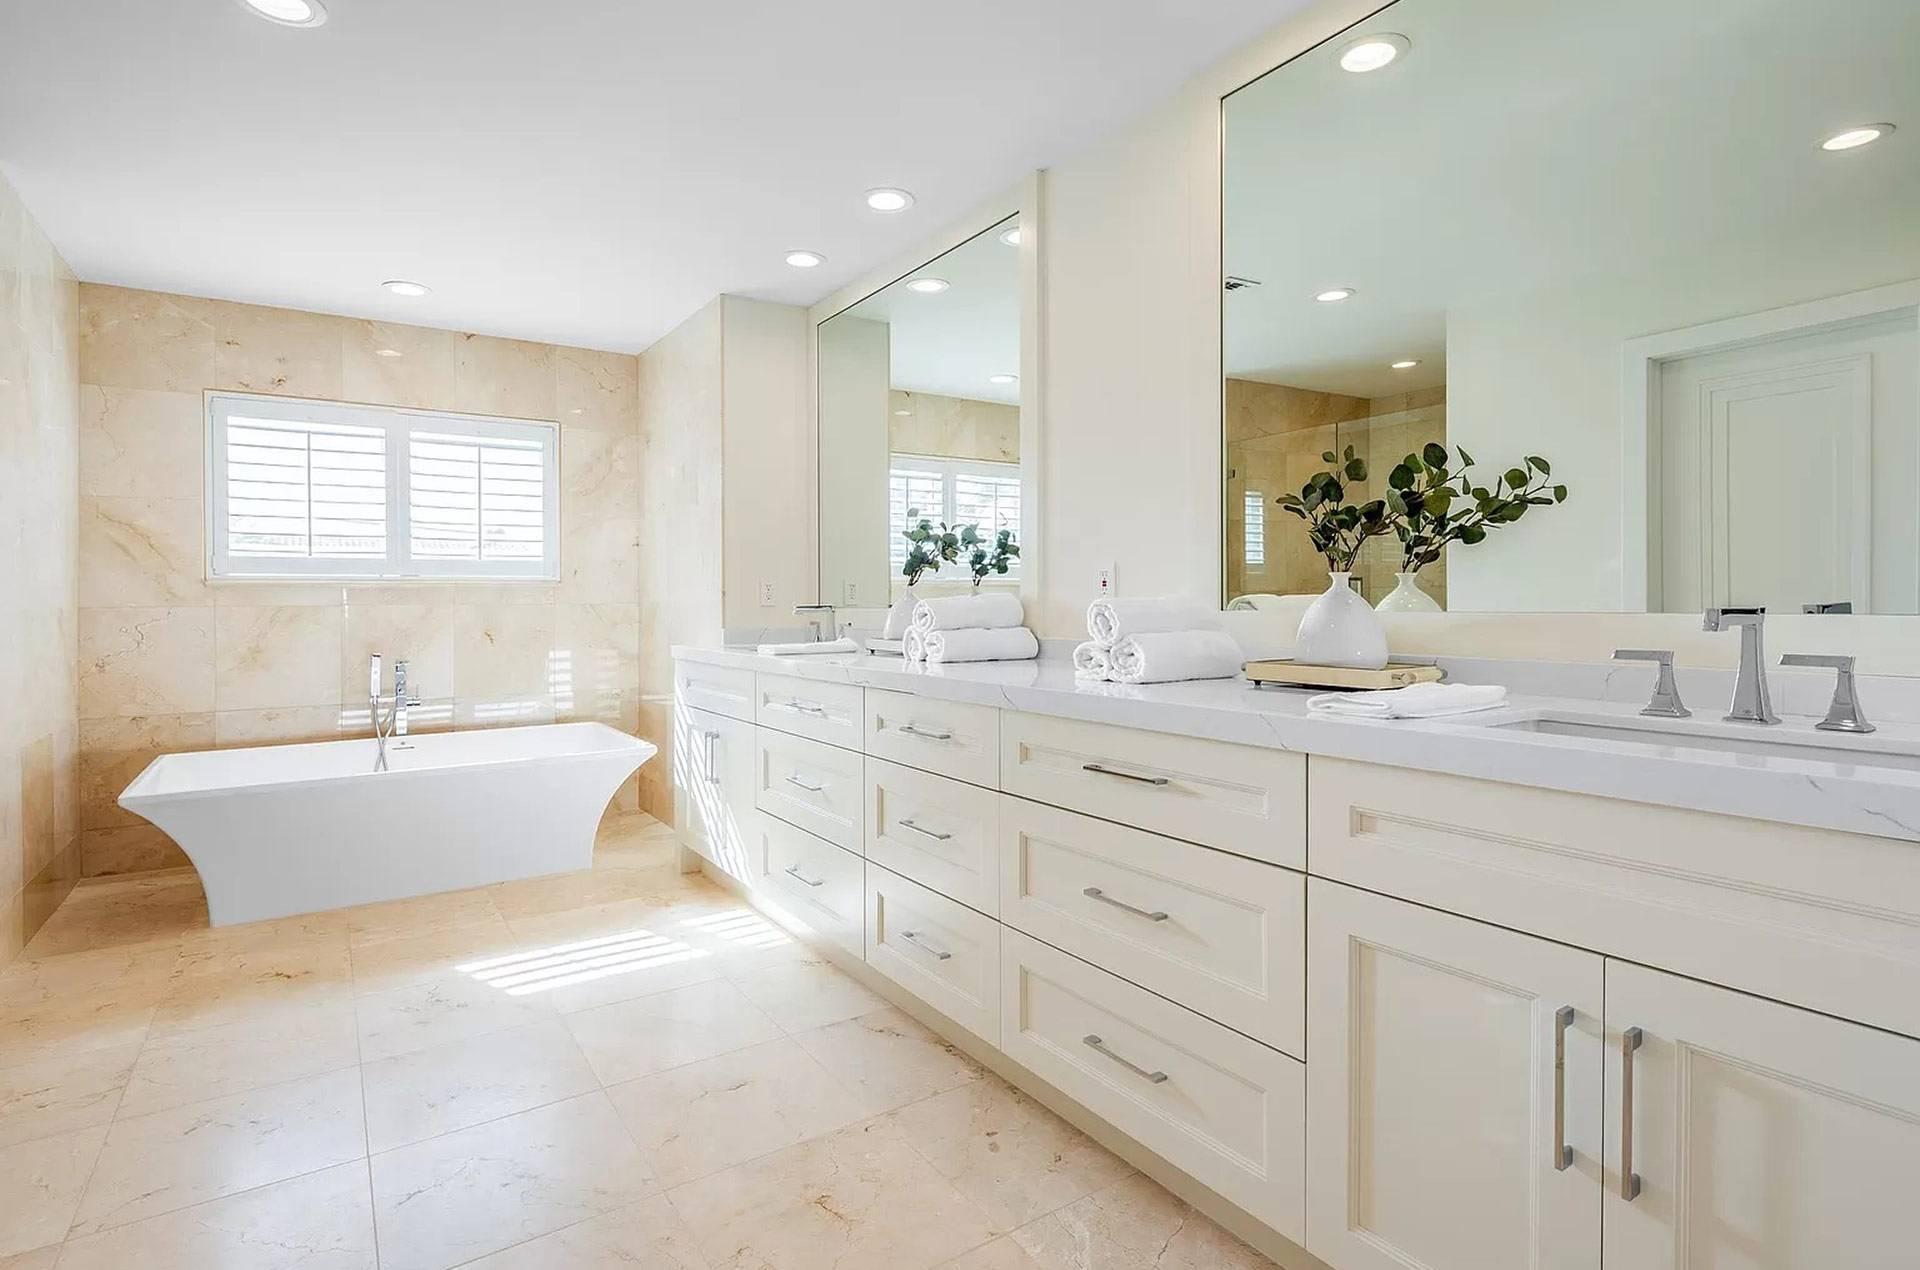 Bathroom Remodel in Boca Raton, Boynton Beach, Delray Beach, Lake Worth